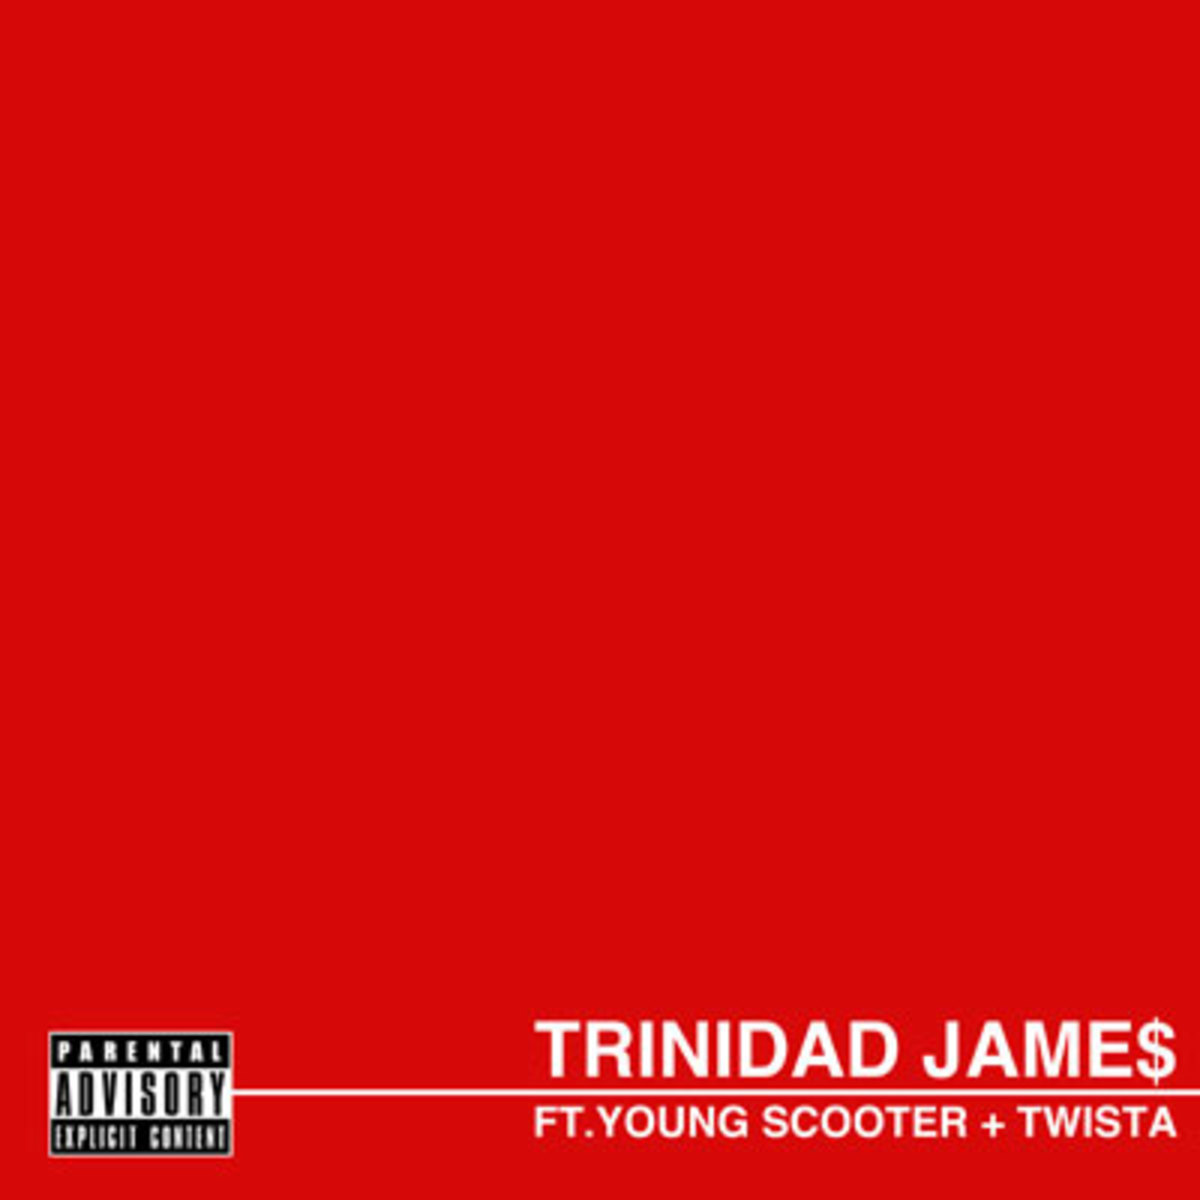 trinidadjames-defjamrmx.jpg